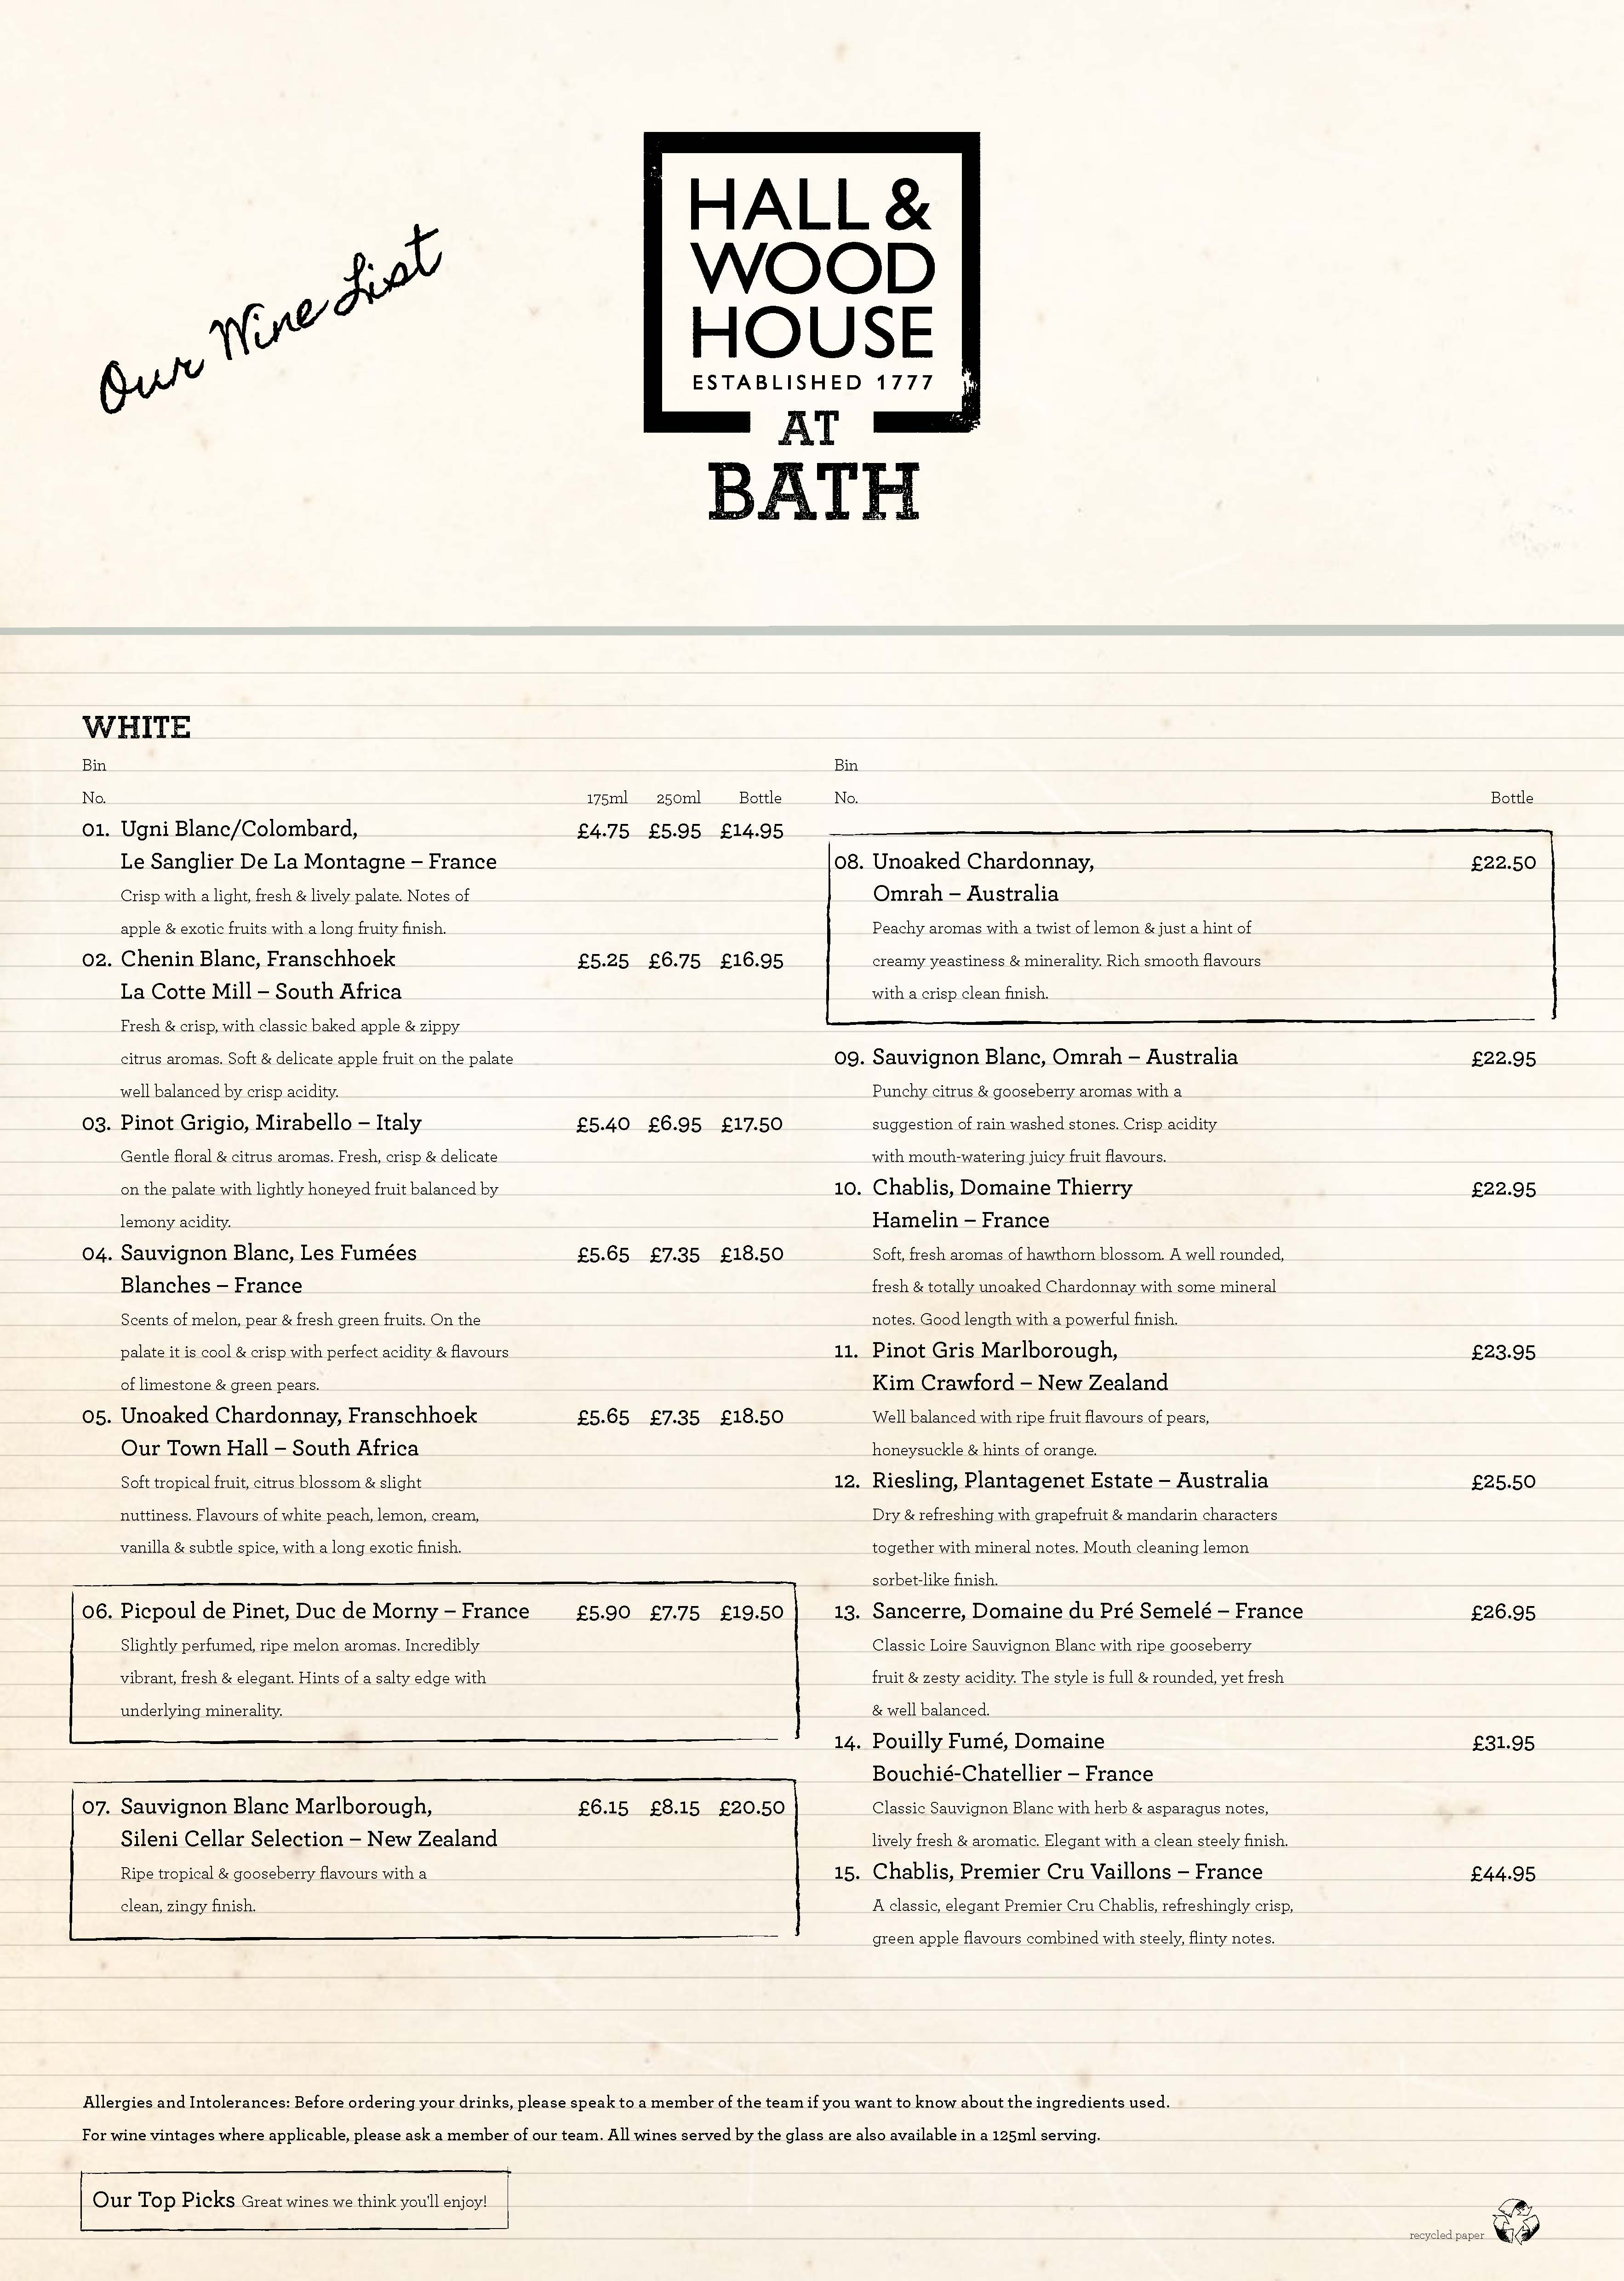 42151 HAL Alchemy Wine List Summer 2016 Price Band C BATH Page 1. Bath Shop List